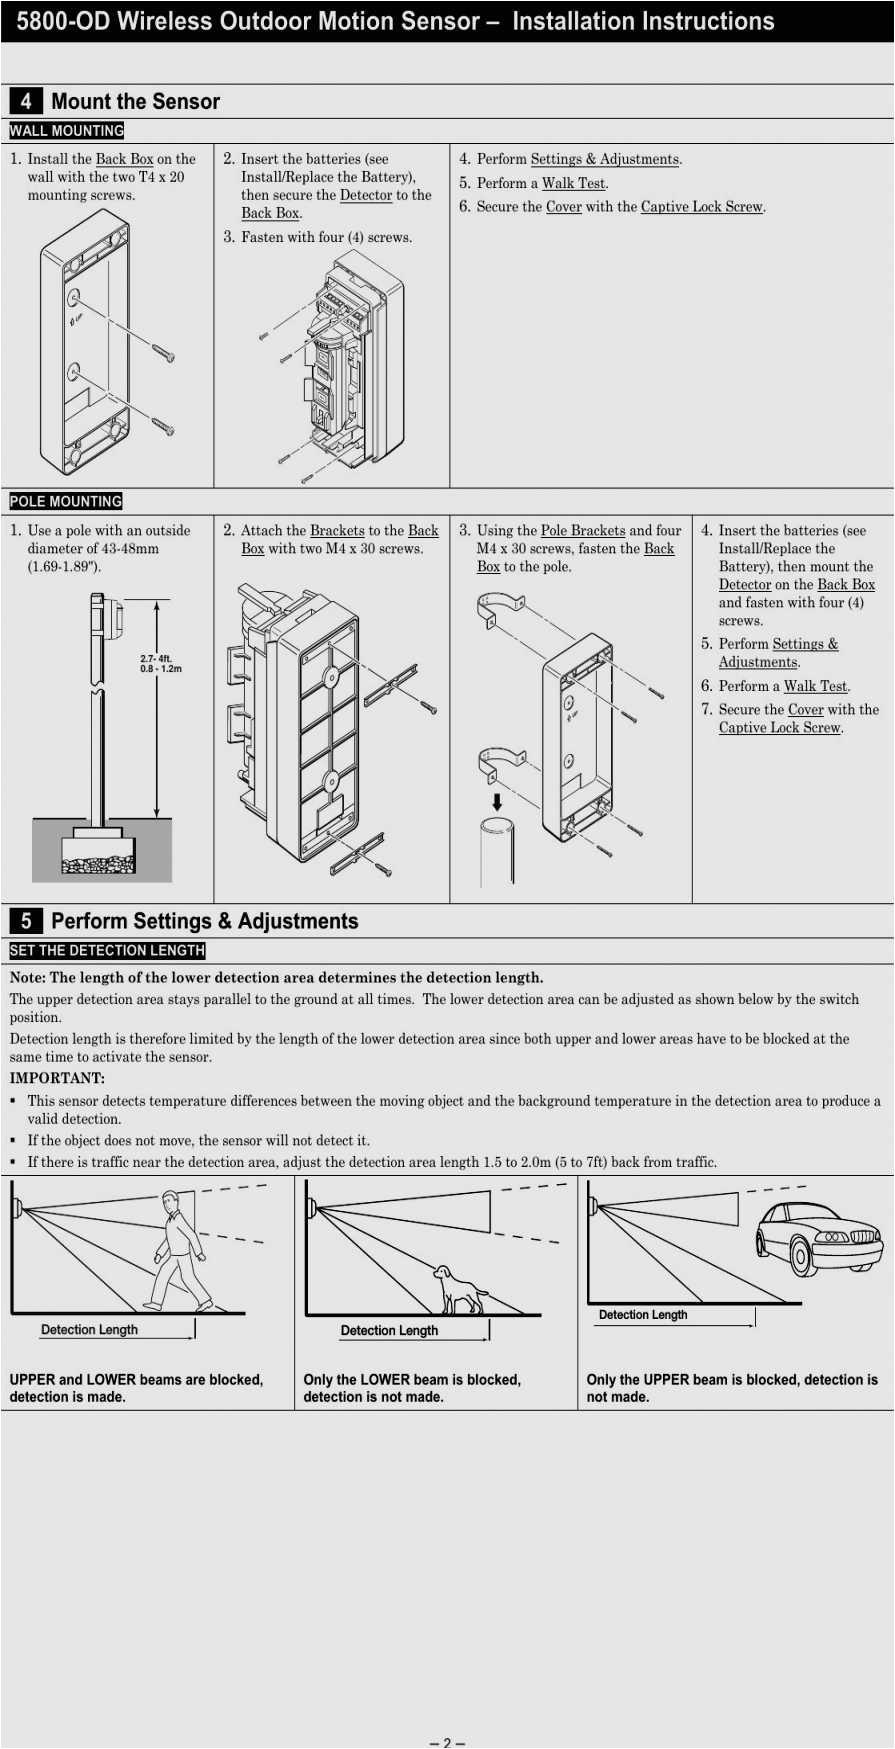 Pir Sensor Light Wiring Diagram Pir Motion Sensor Wiring Diagram Wiring Diagrams